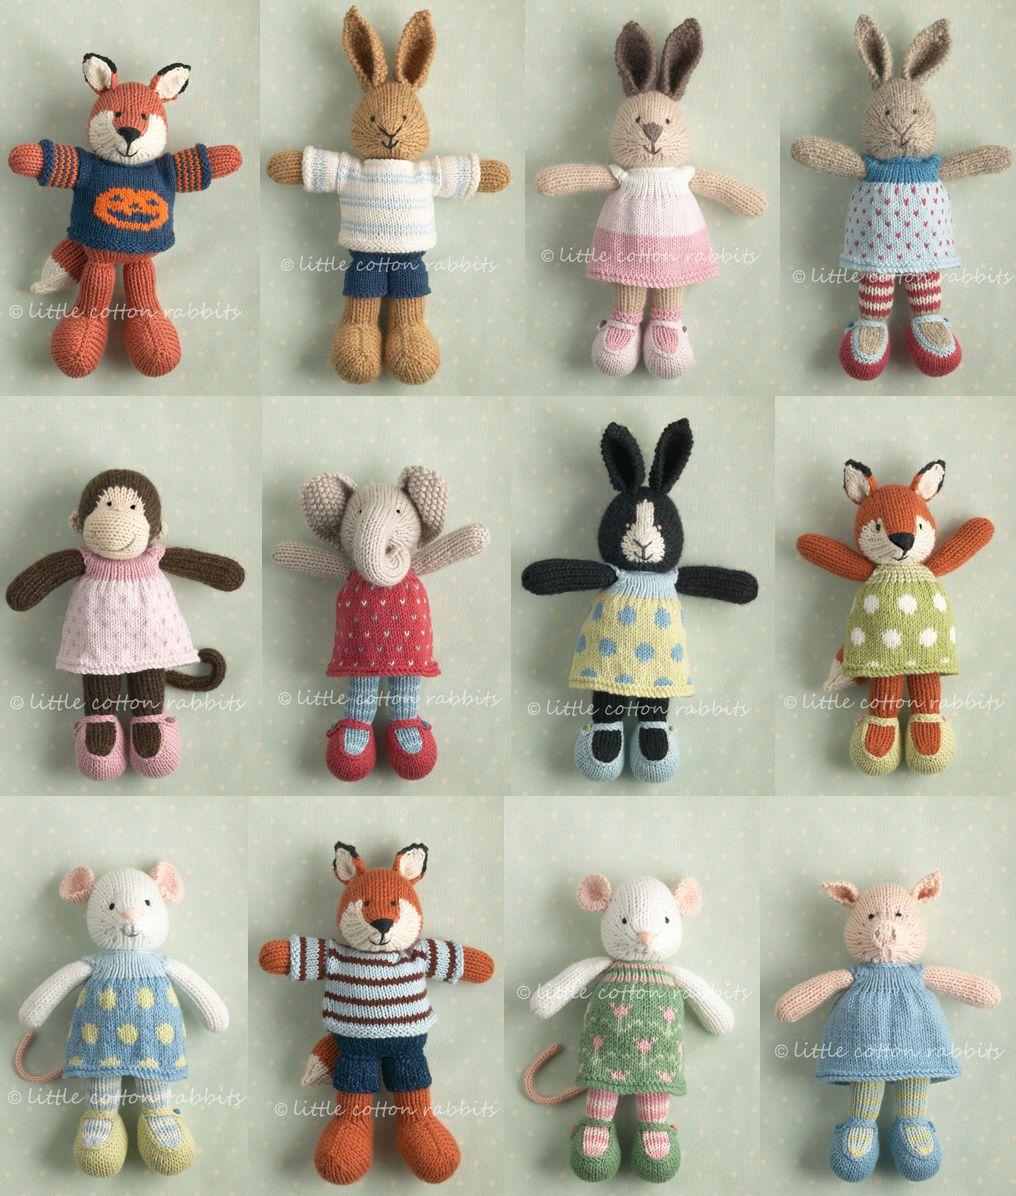 Little Cotton Rabbits   Little cotton rabbits, Knitting patterns ...